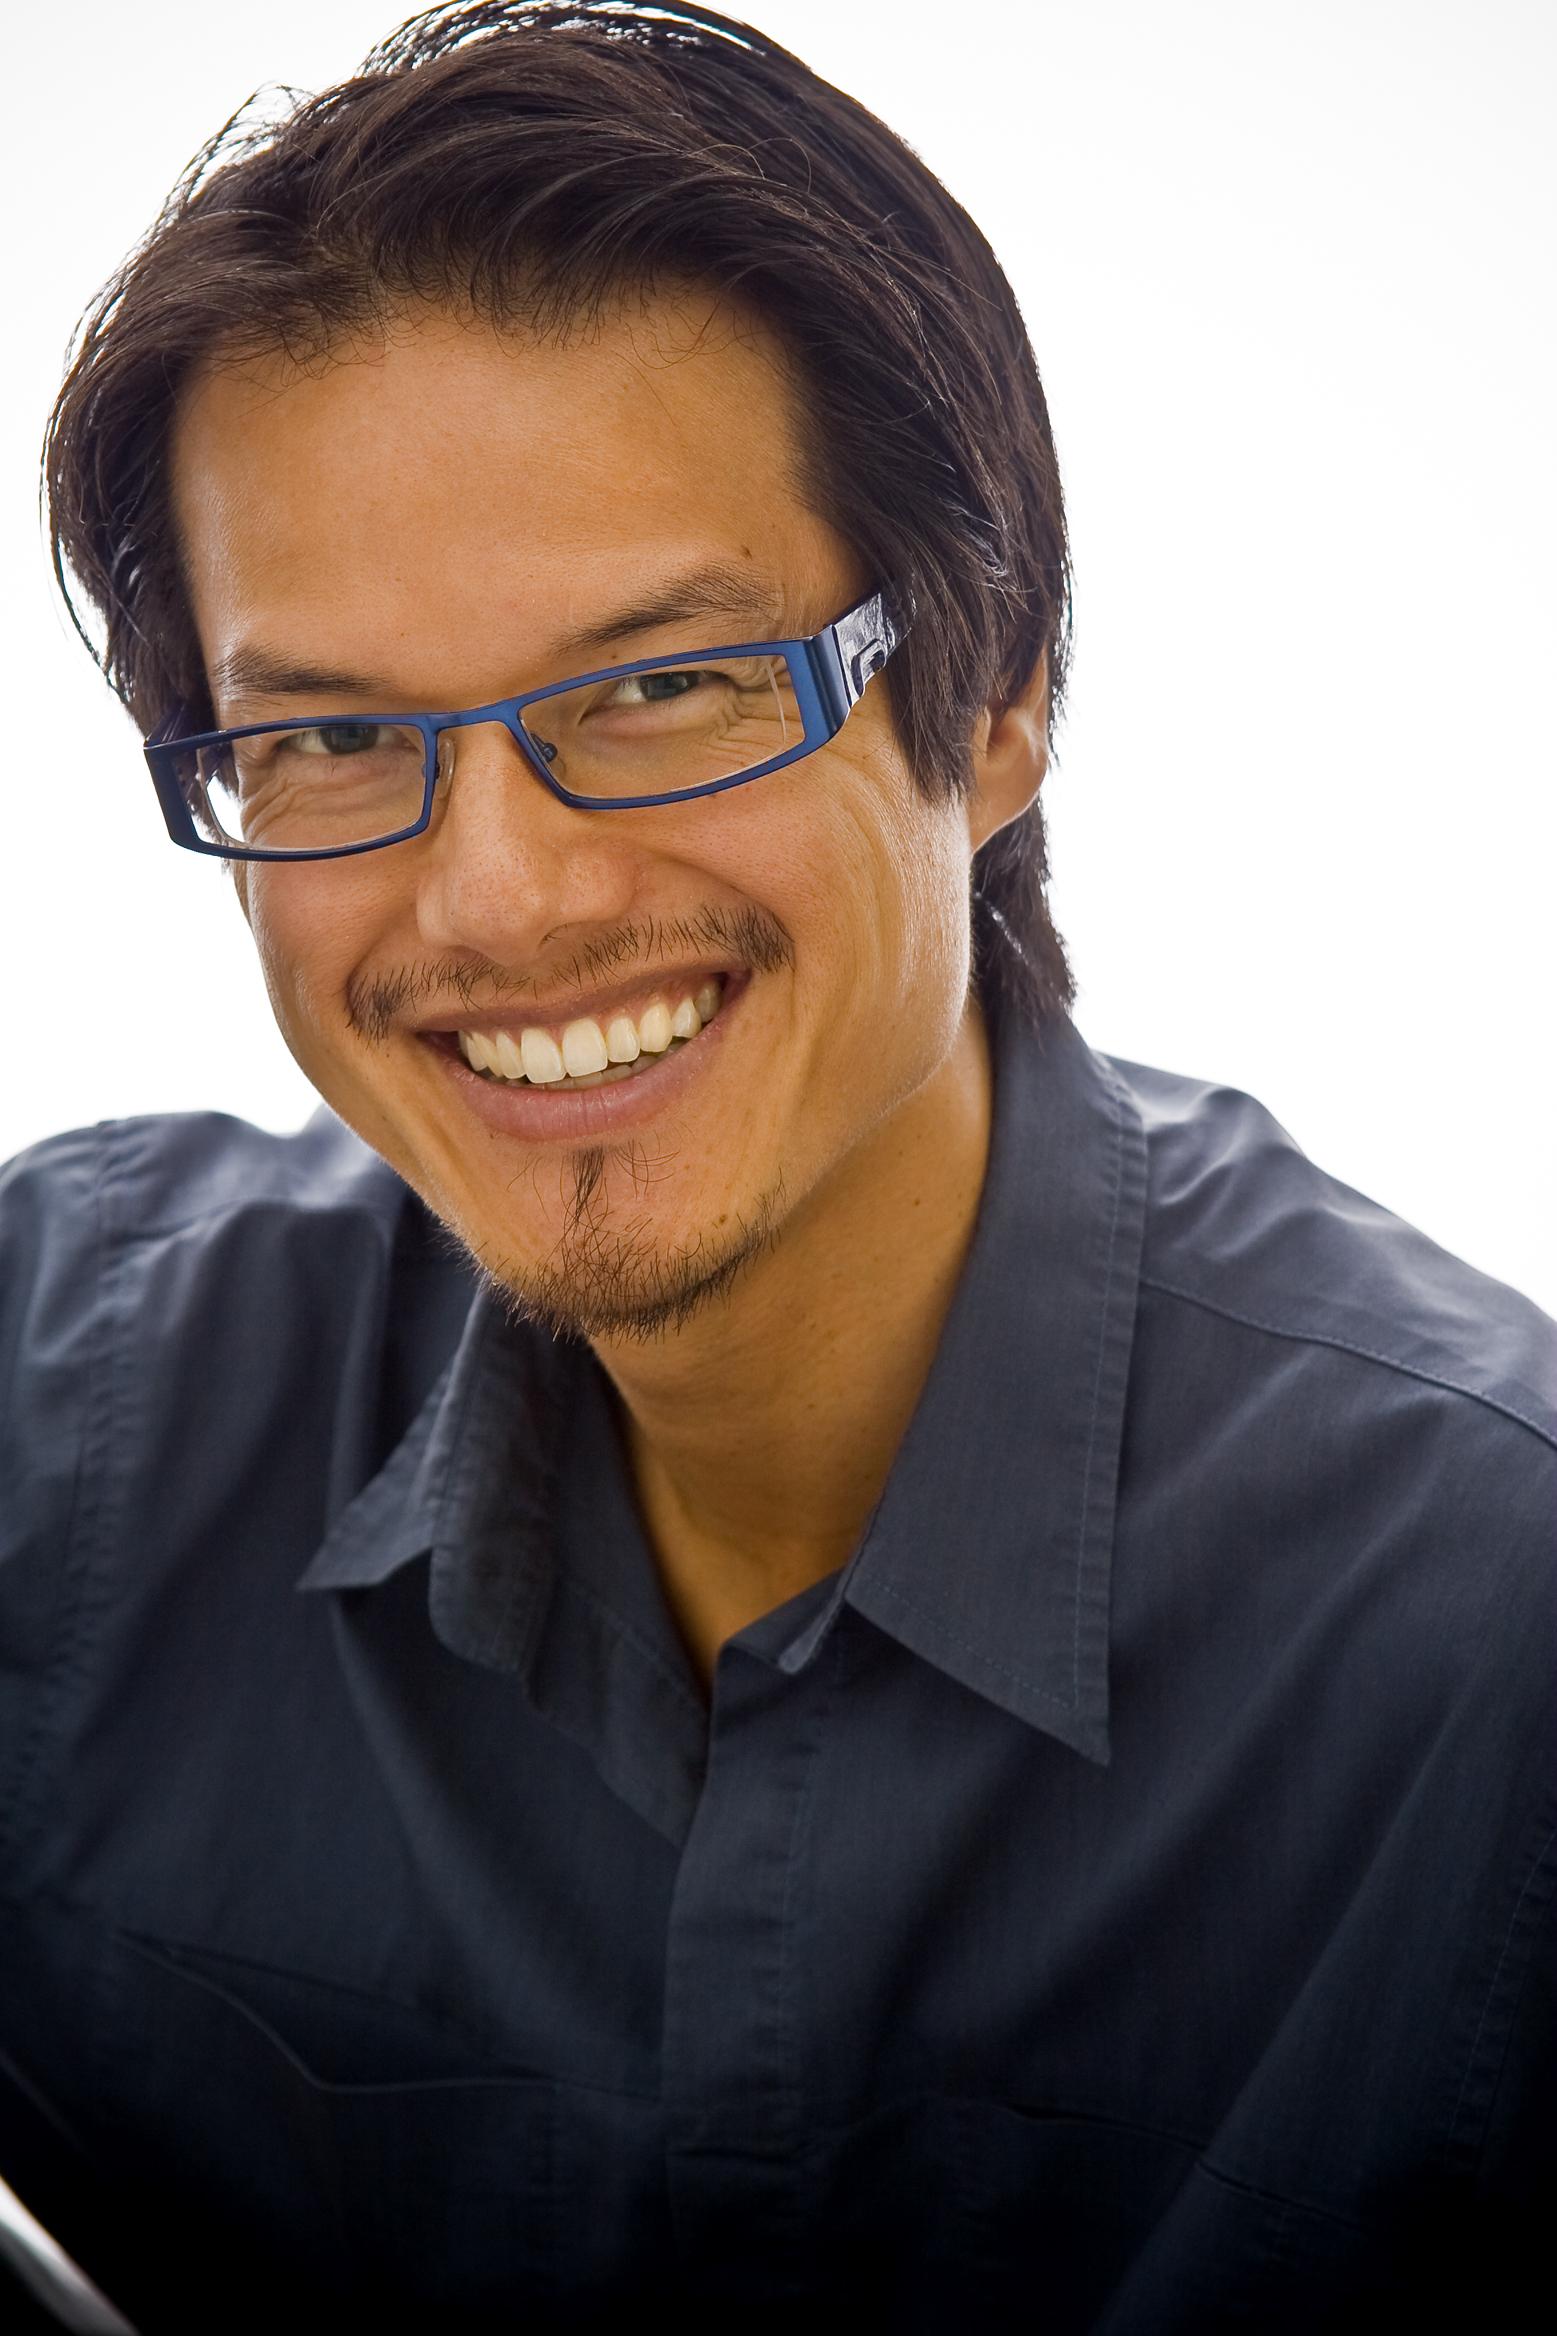 Jon Yeo - Executive Speaker Coach - Spreading Your Brand Story